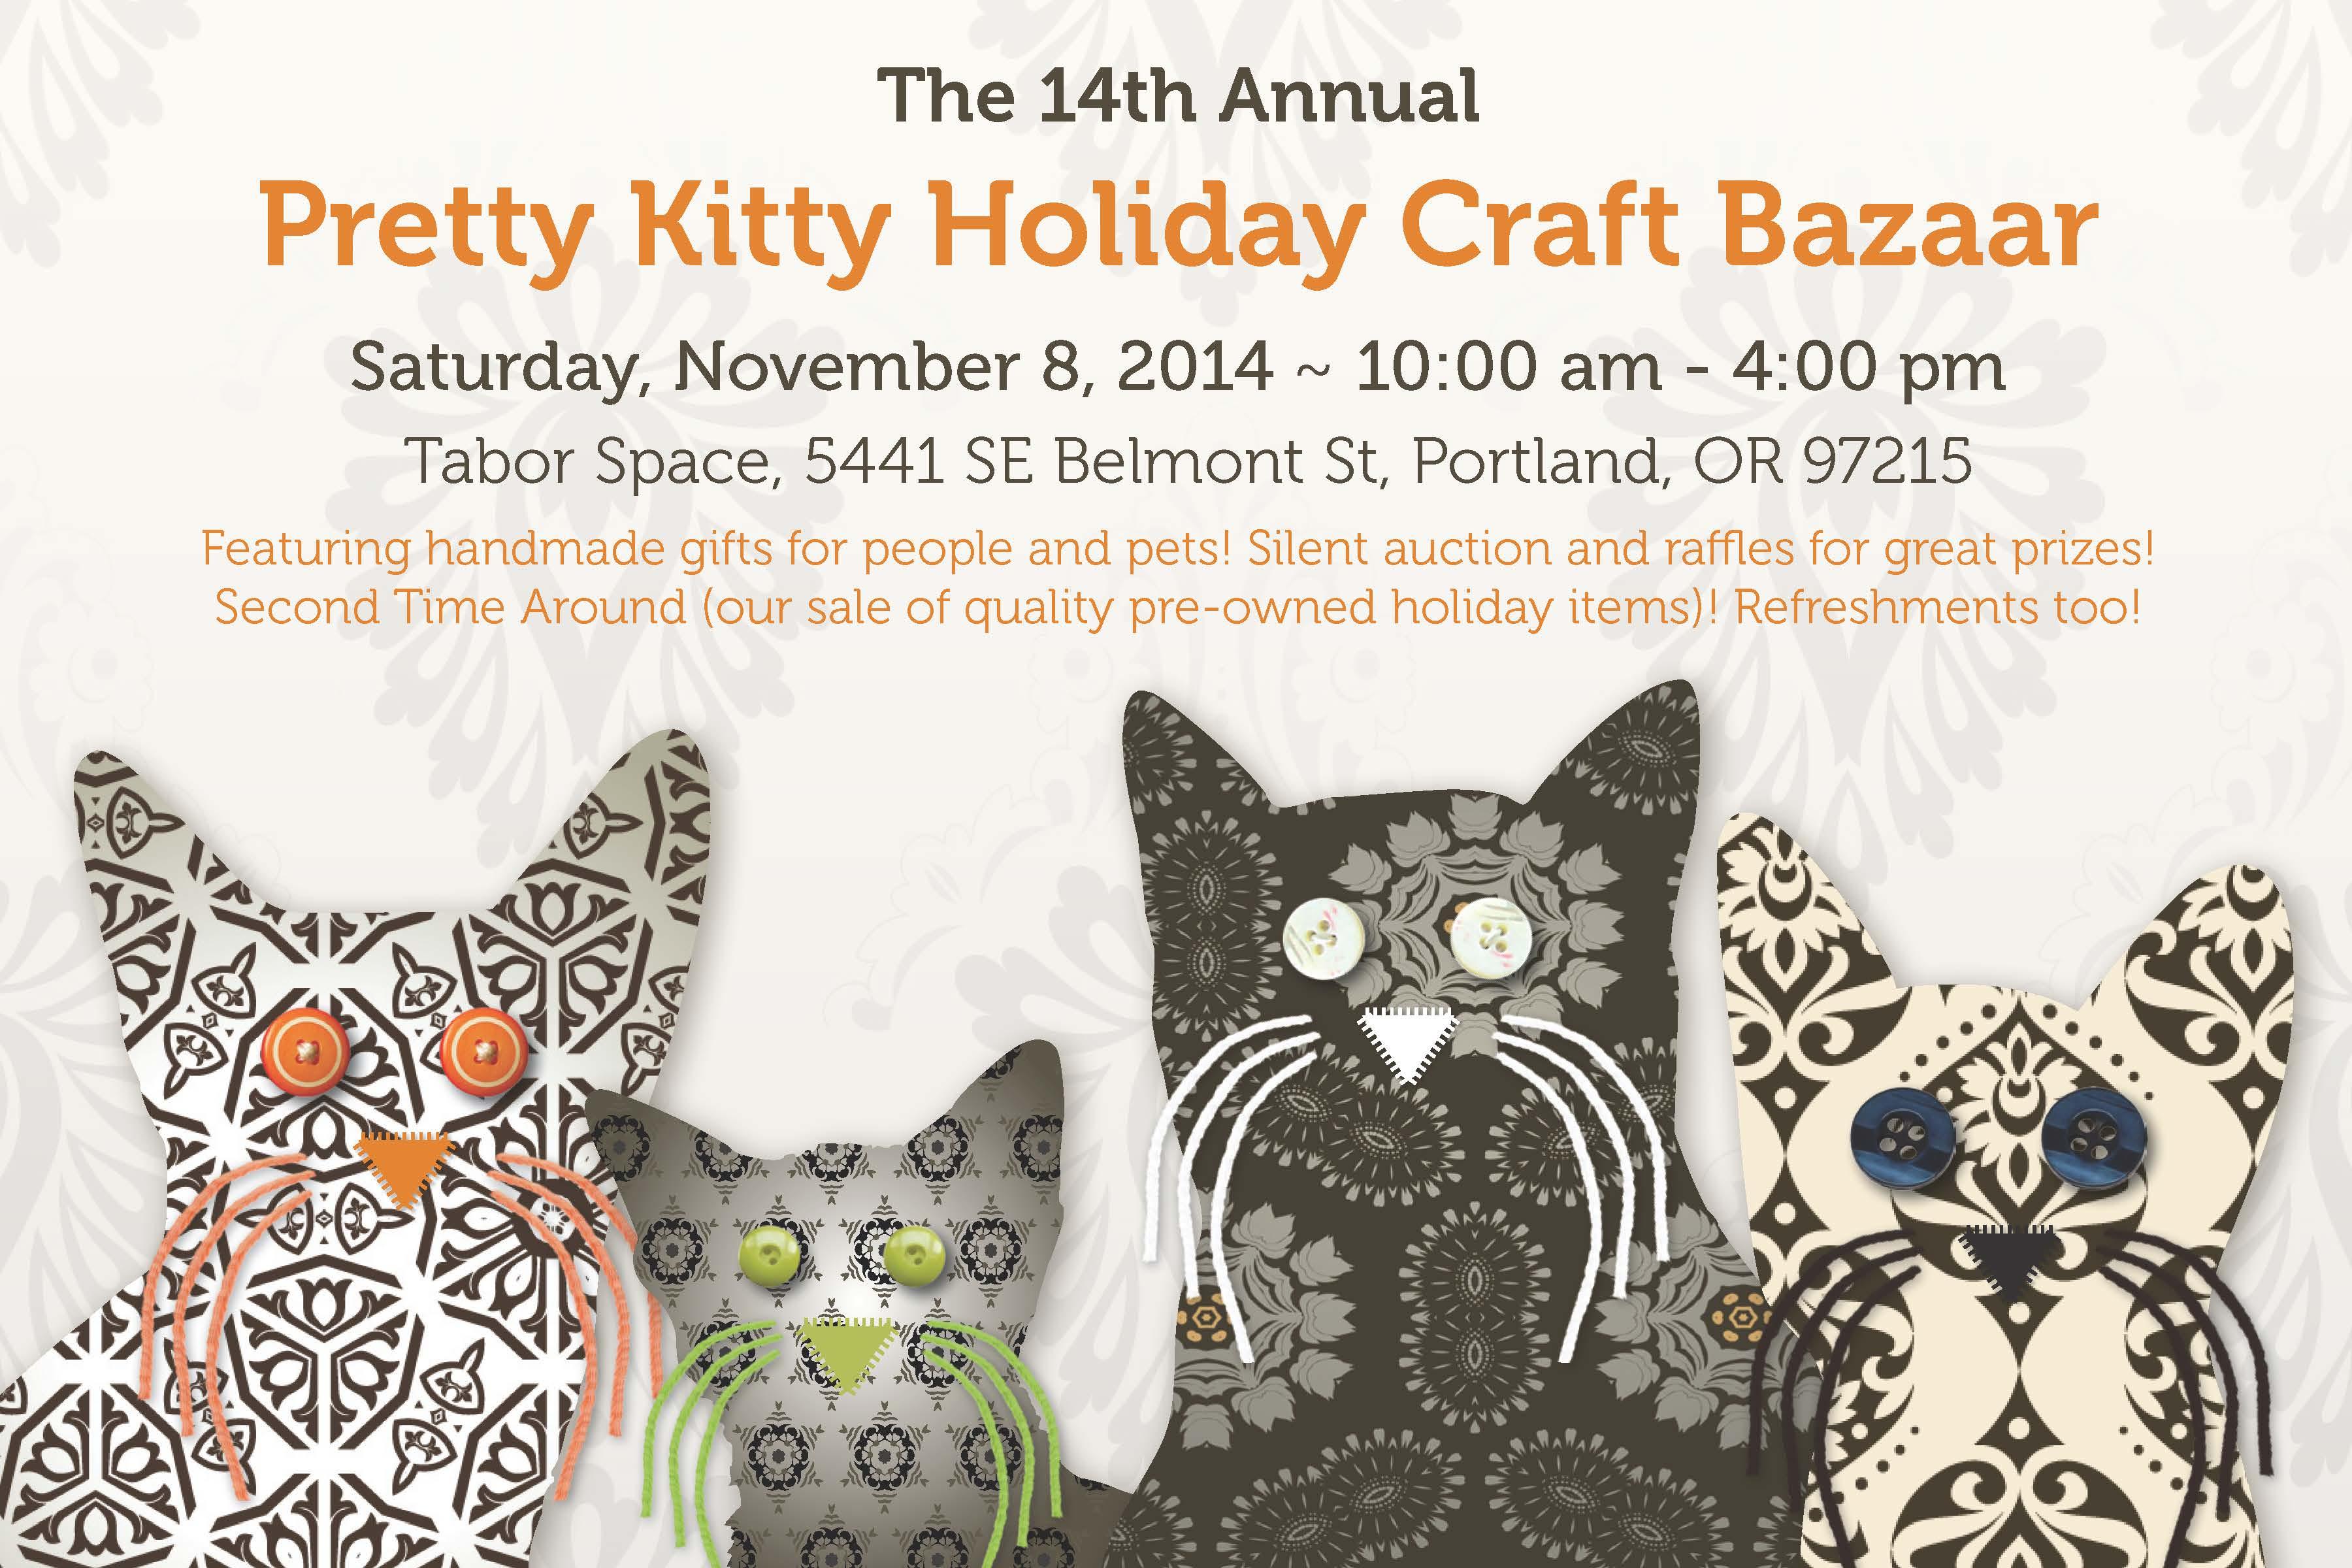 14th Annual Pretty Kitty Holiday Craft Bazaar on Saturday, November 8